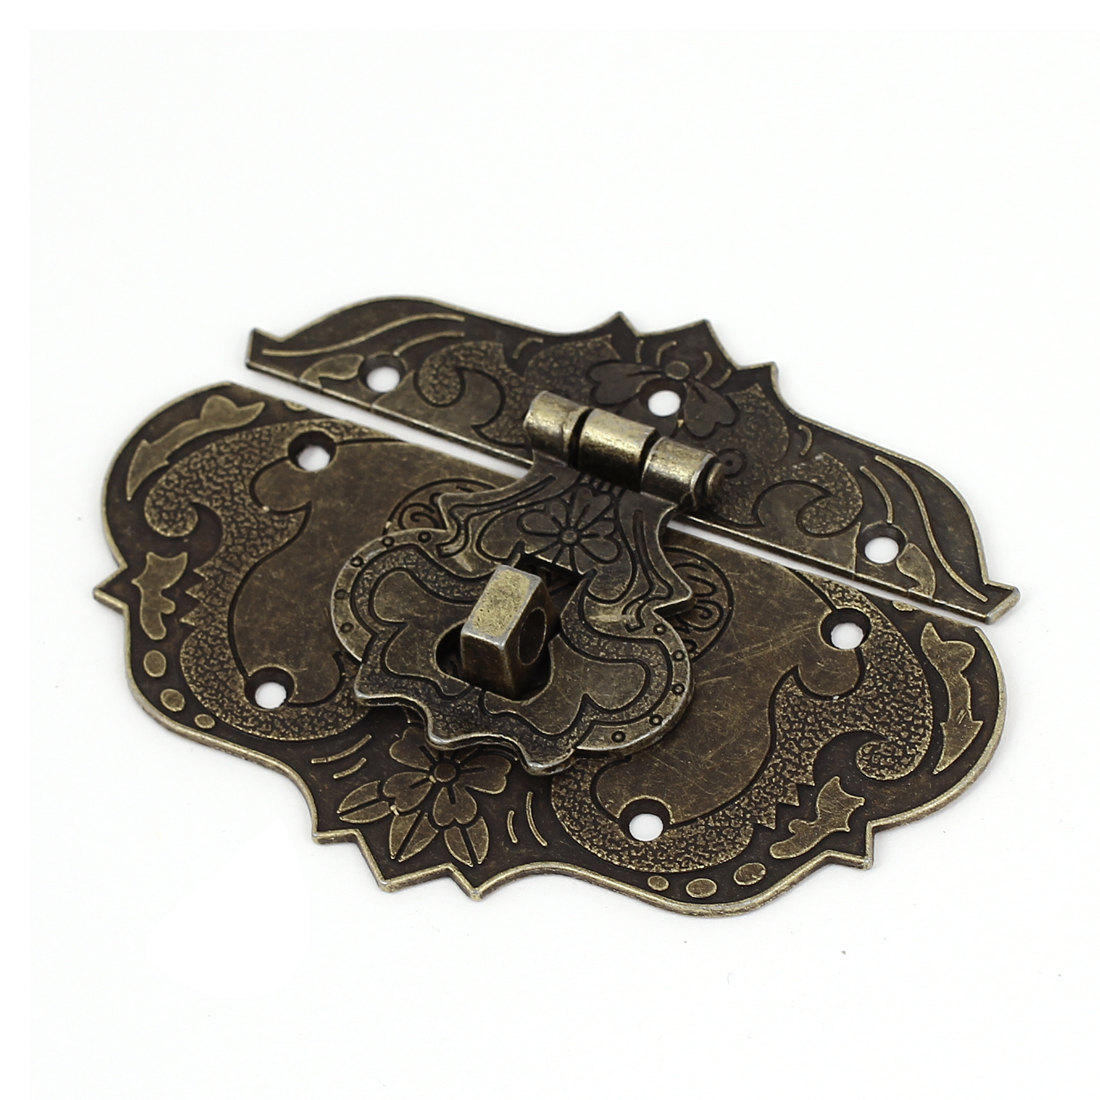 Antique Style Wooden Case Chest Toolbox 86x65mm Clasp Hasp Latch Bronze Tone by Unique-Bargains